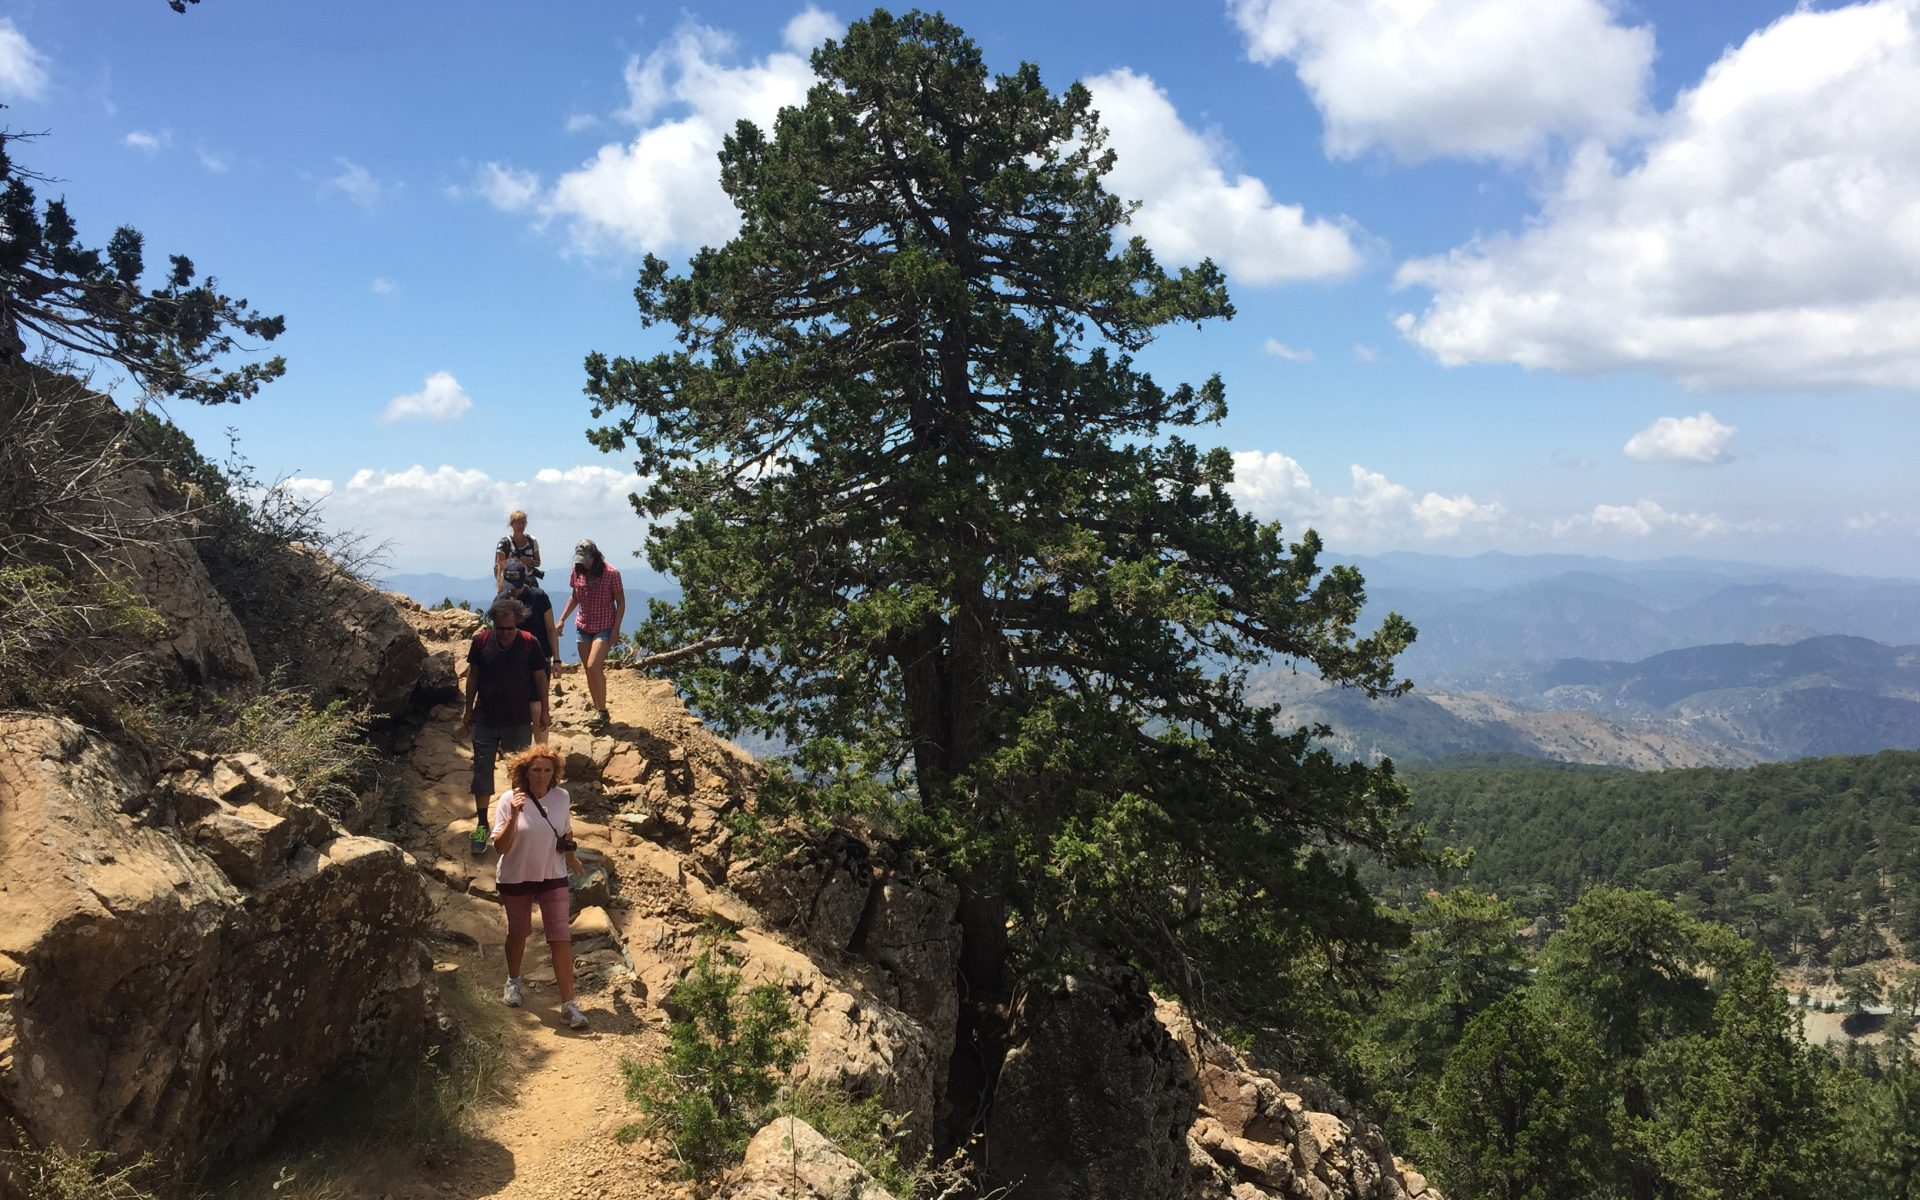 Wandern, Wanderung, Höhenweg, Berg, Berge, Olymp, Olympos, Artemis, Ophiolith, Plutonisches Gestein, Zypern